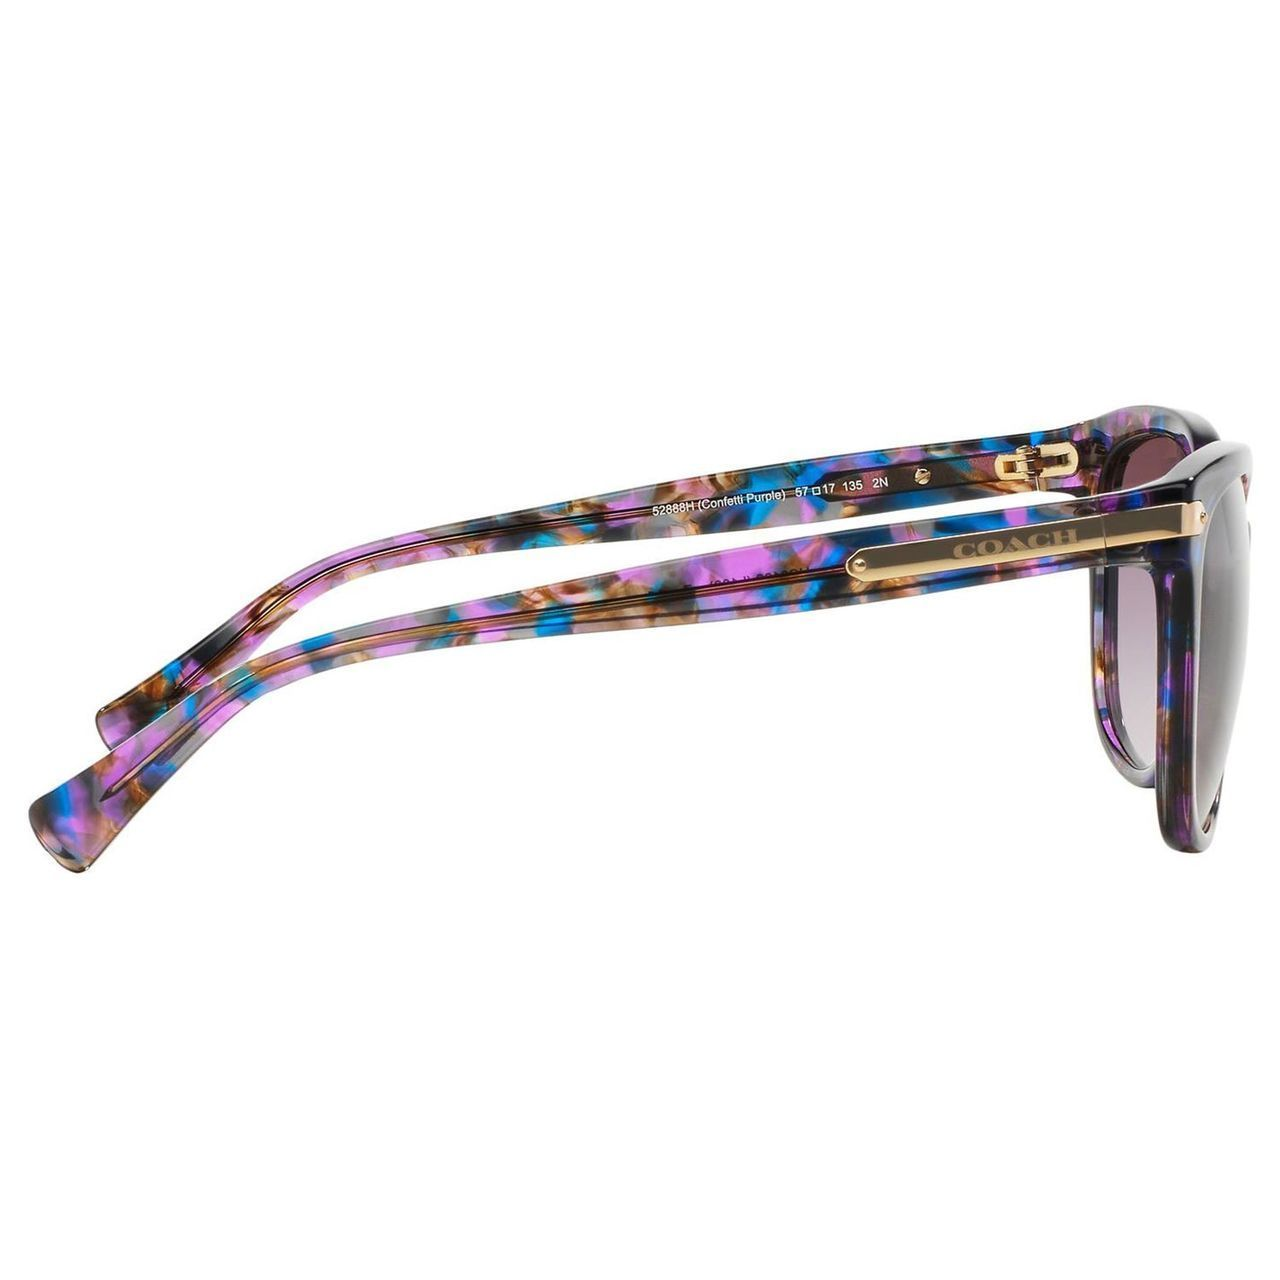 6b68188dcebb ... czech shop coach womens hc8132 l109 52888h plastic cat eye sunglasses  purple free shipping today overstock